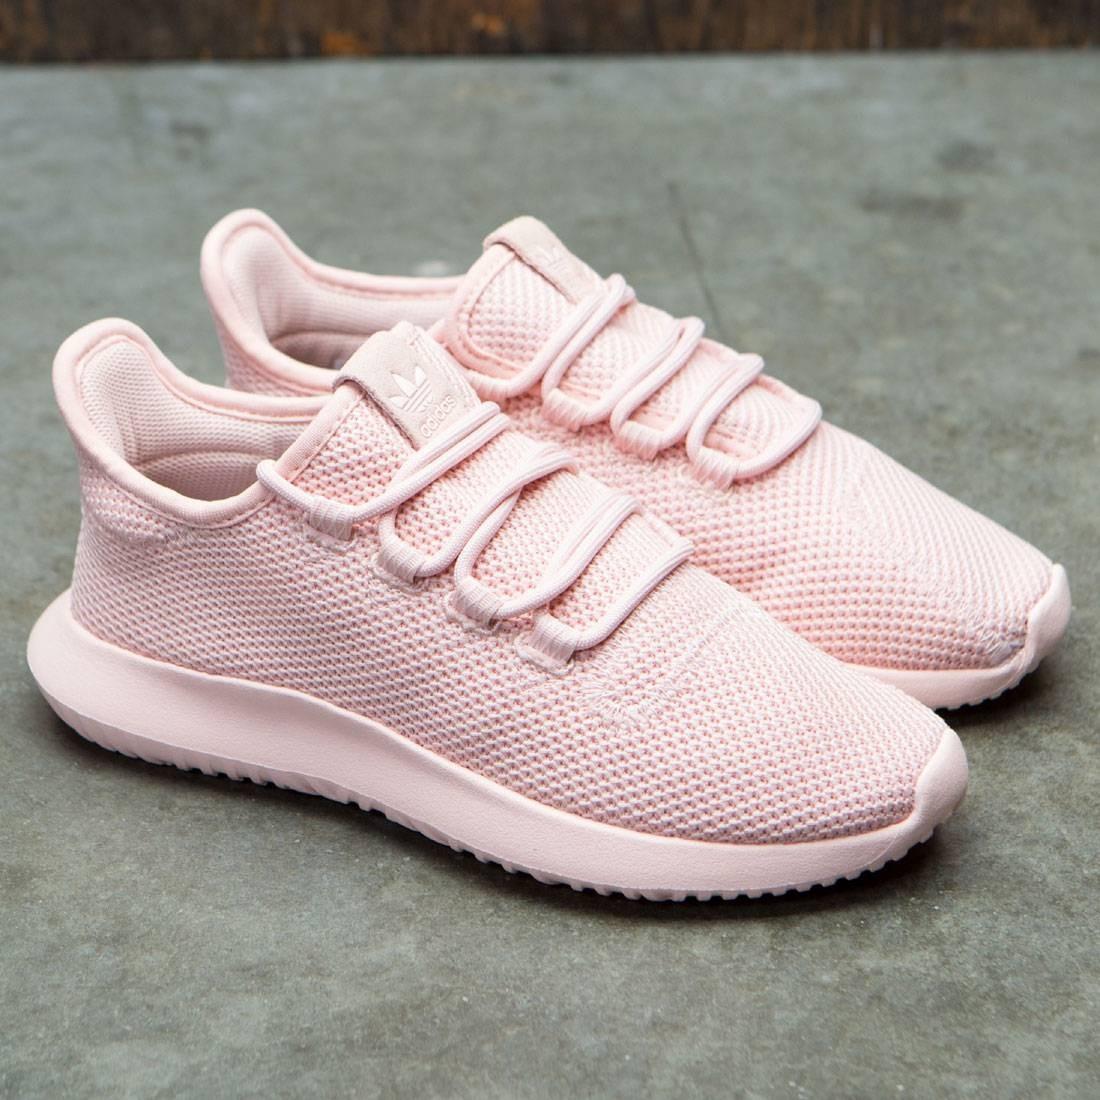 first rate 2ebdd 75991 adidas tubular shadow kids pink